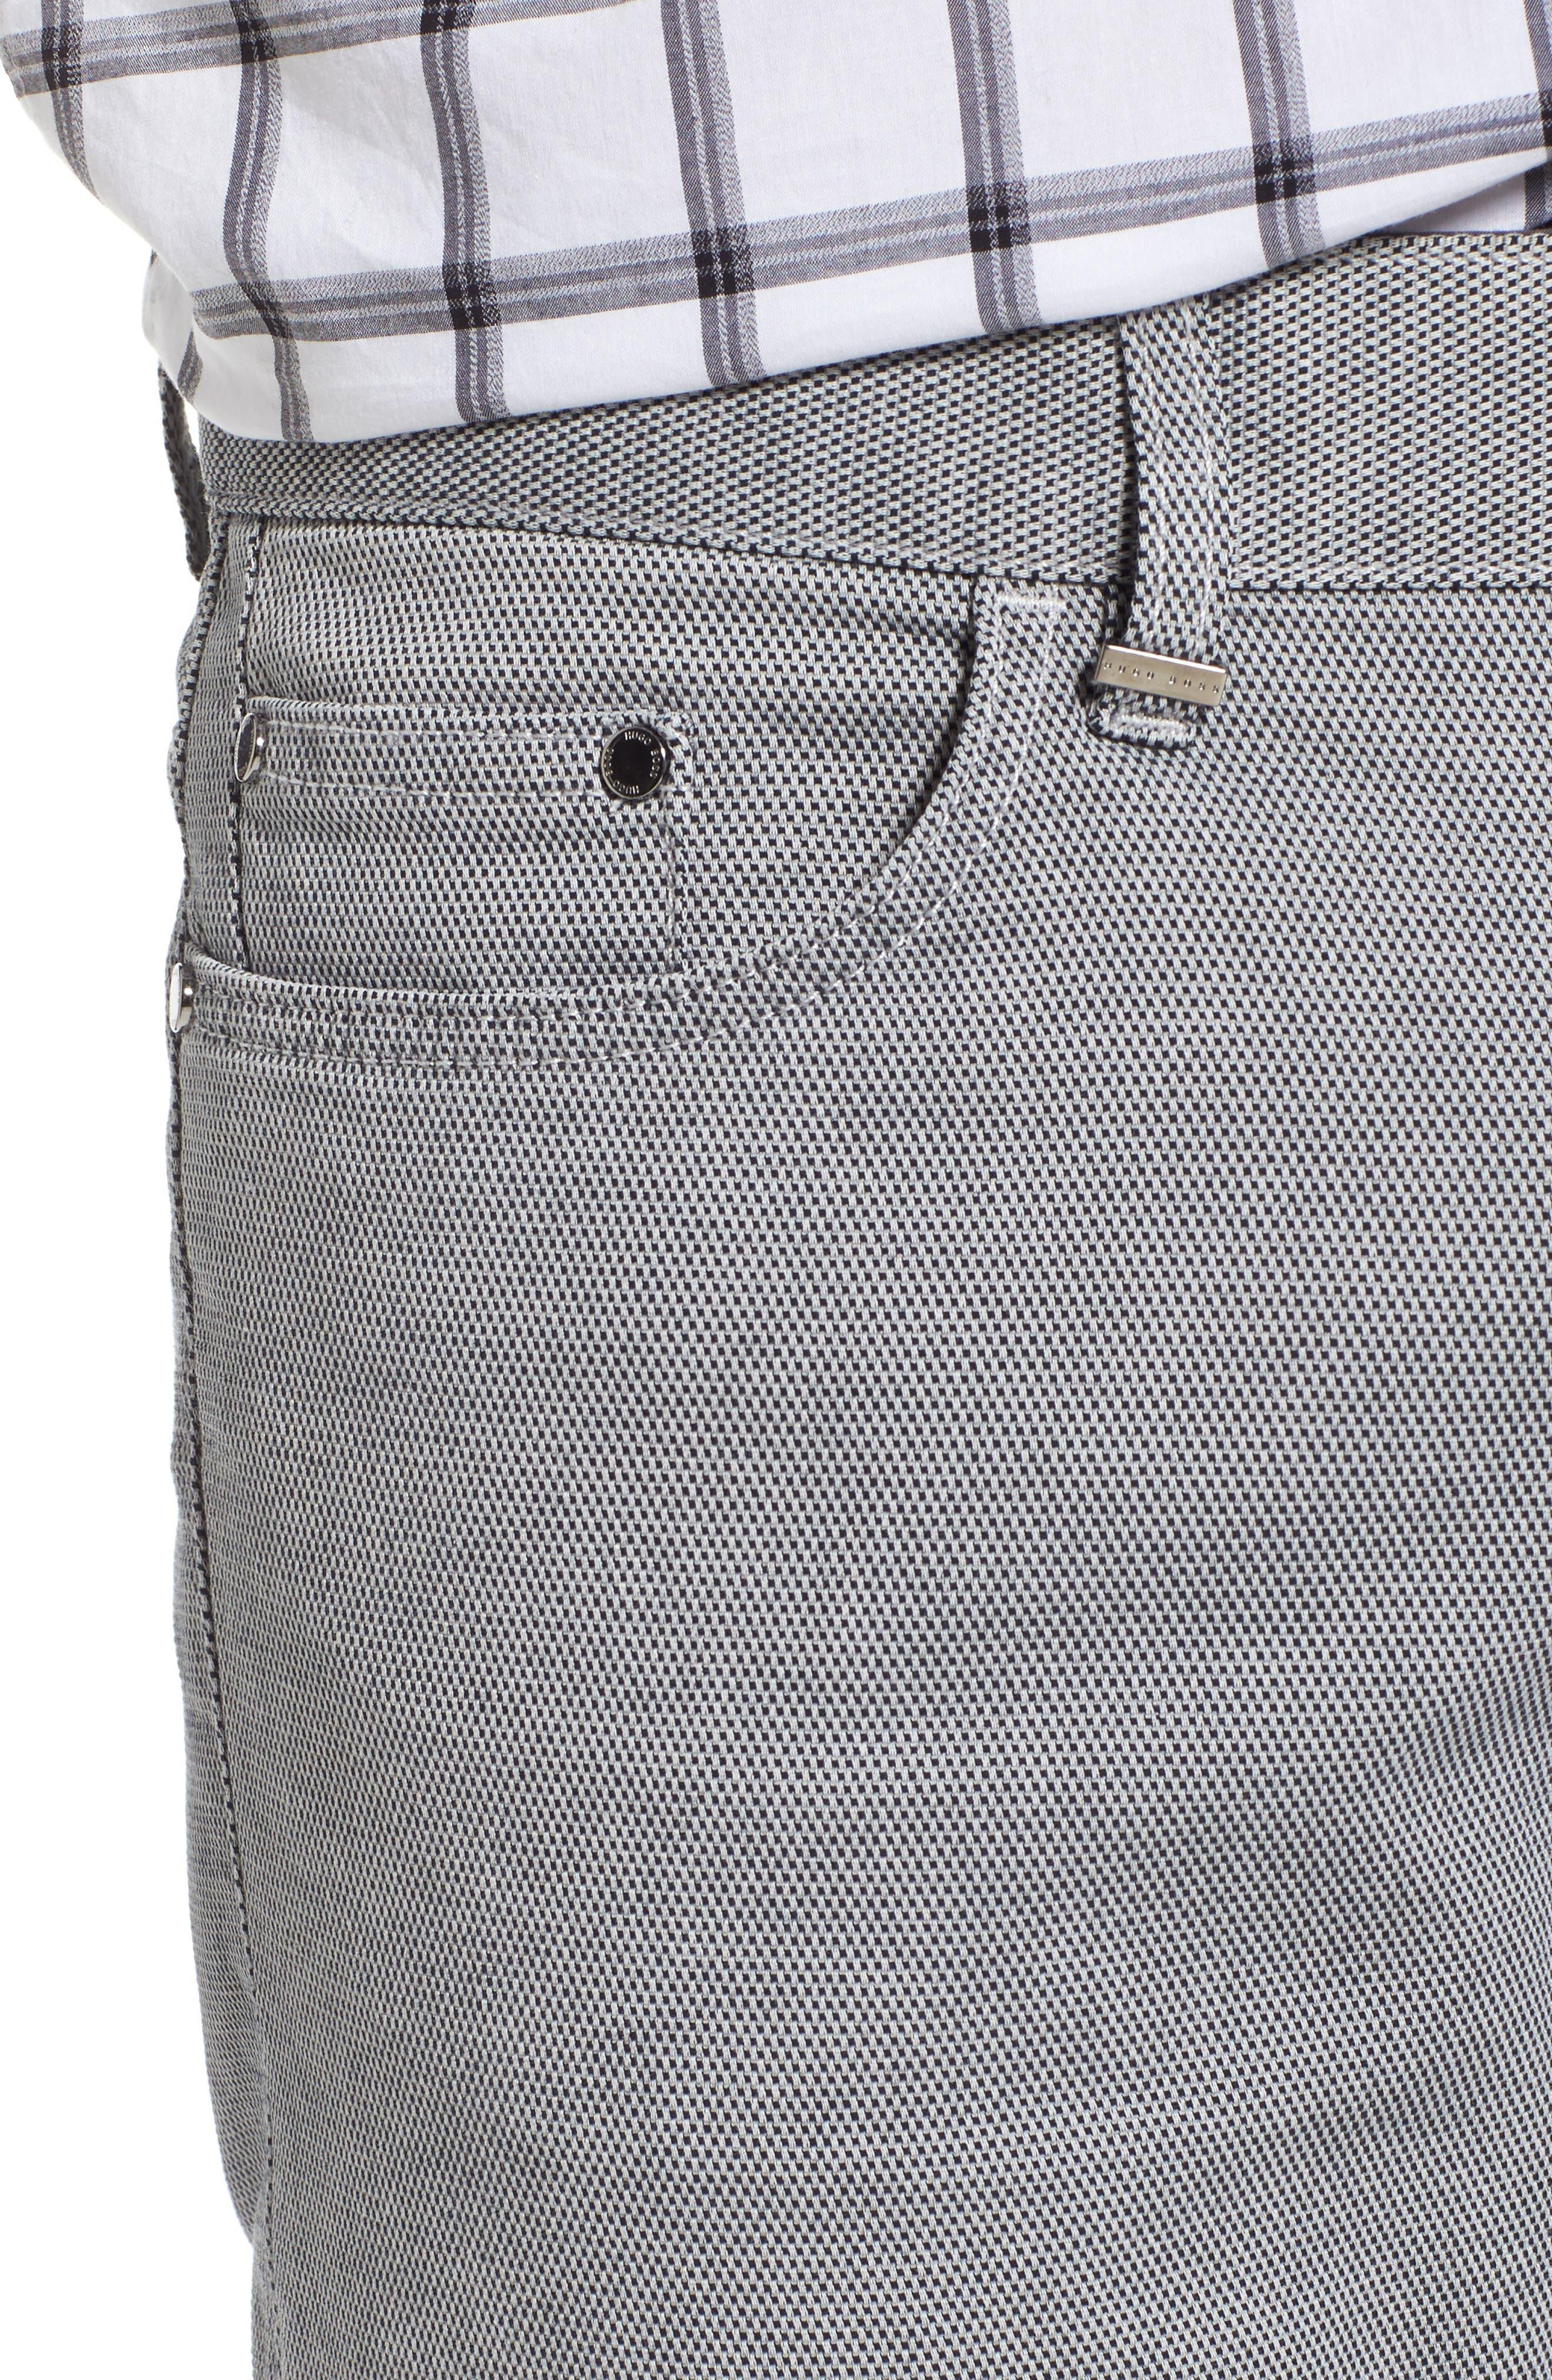 Delaware Slim Fit Structure Jeans,                             Alternate thumbnail 11, color,